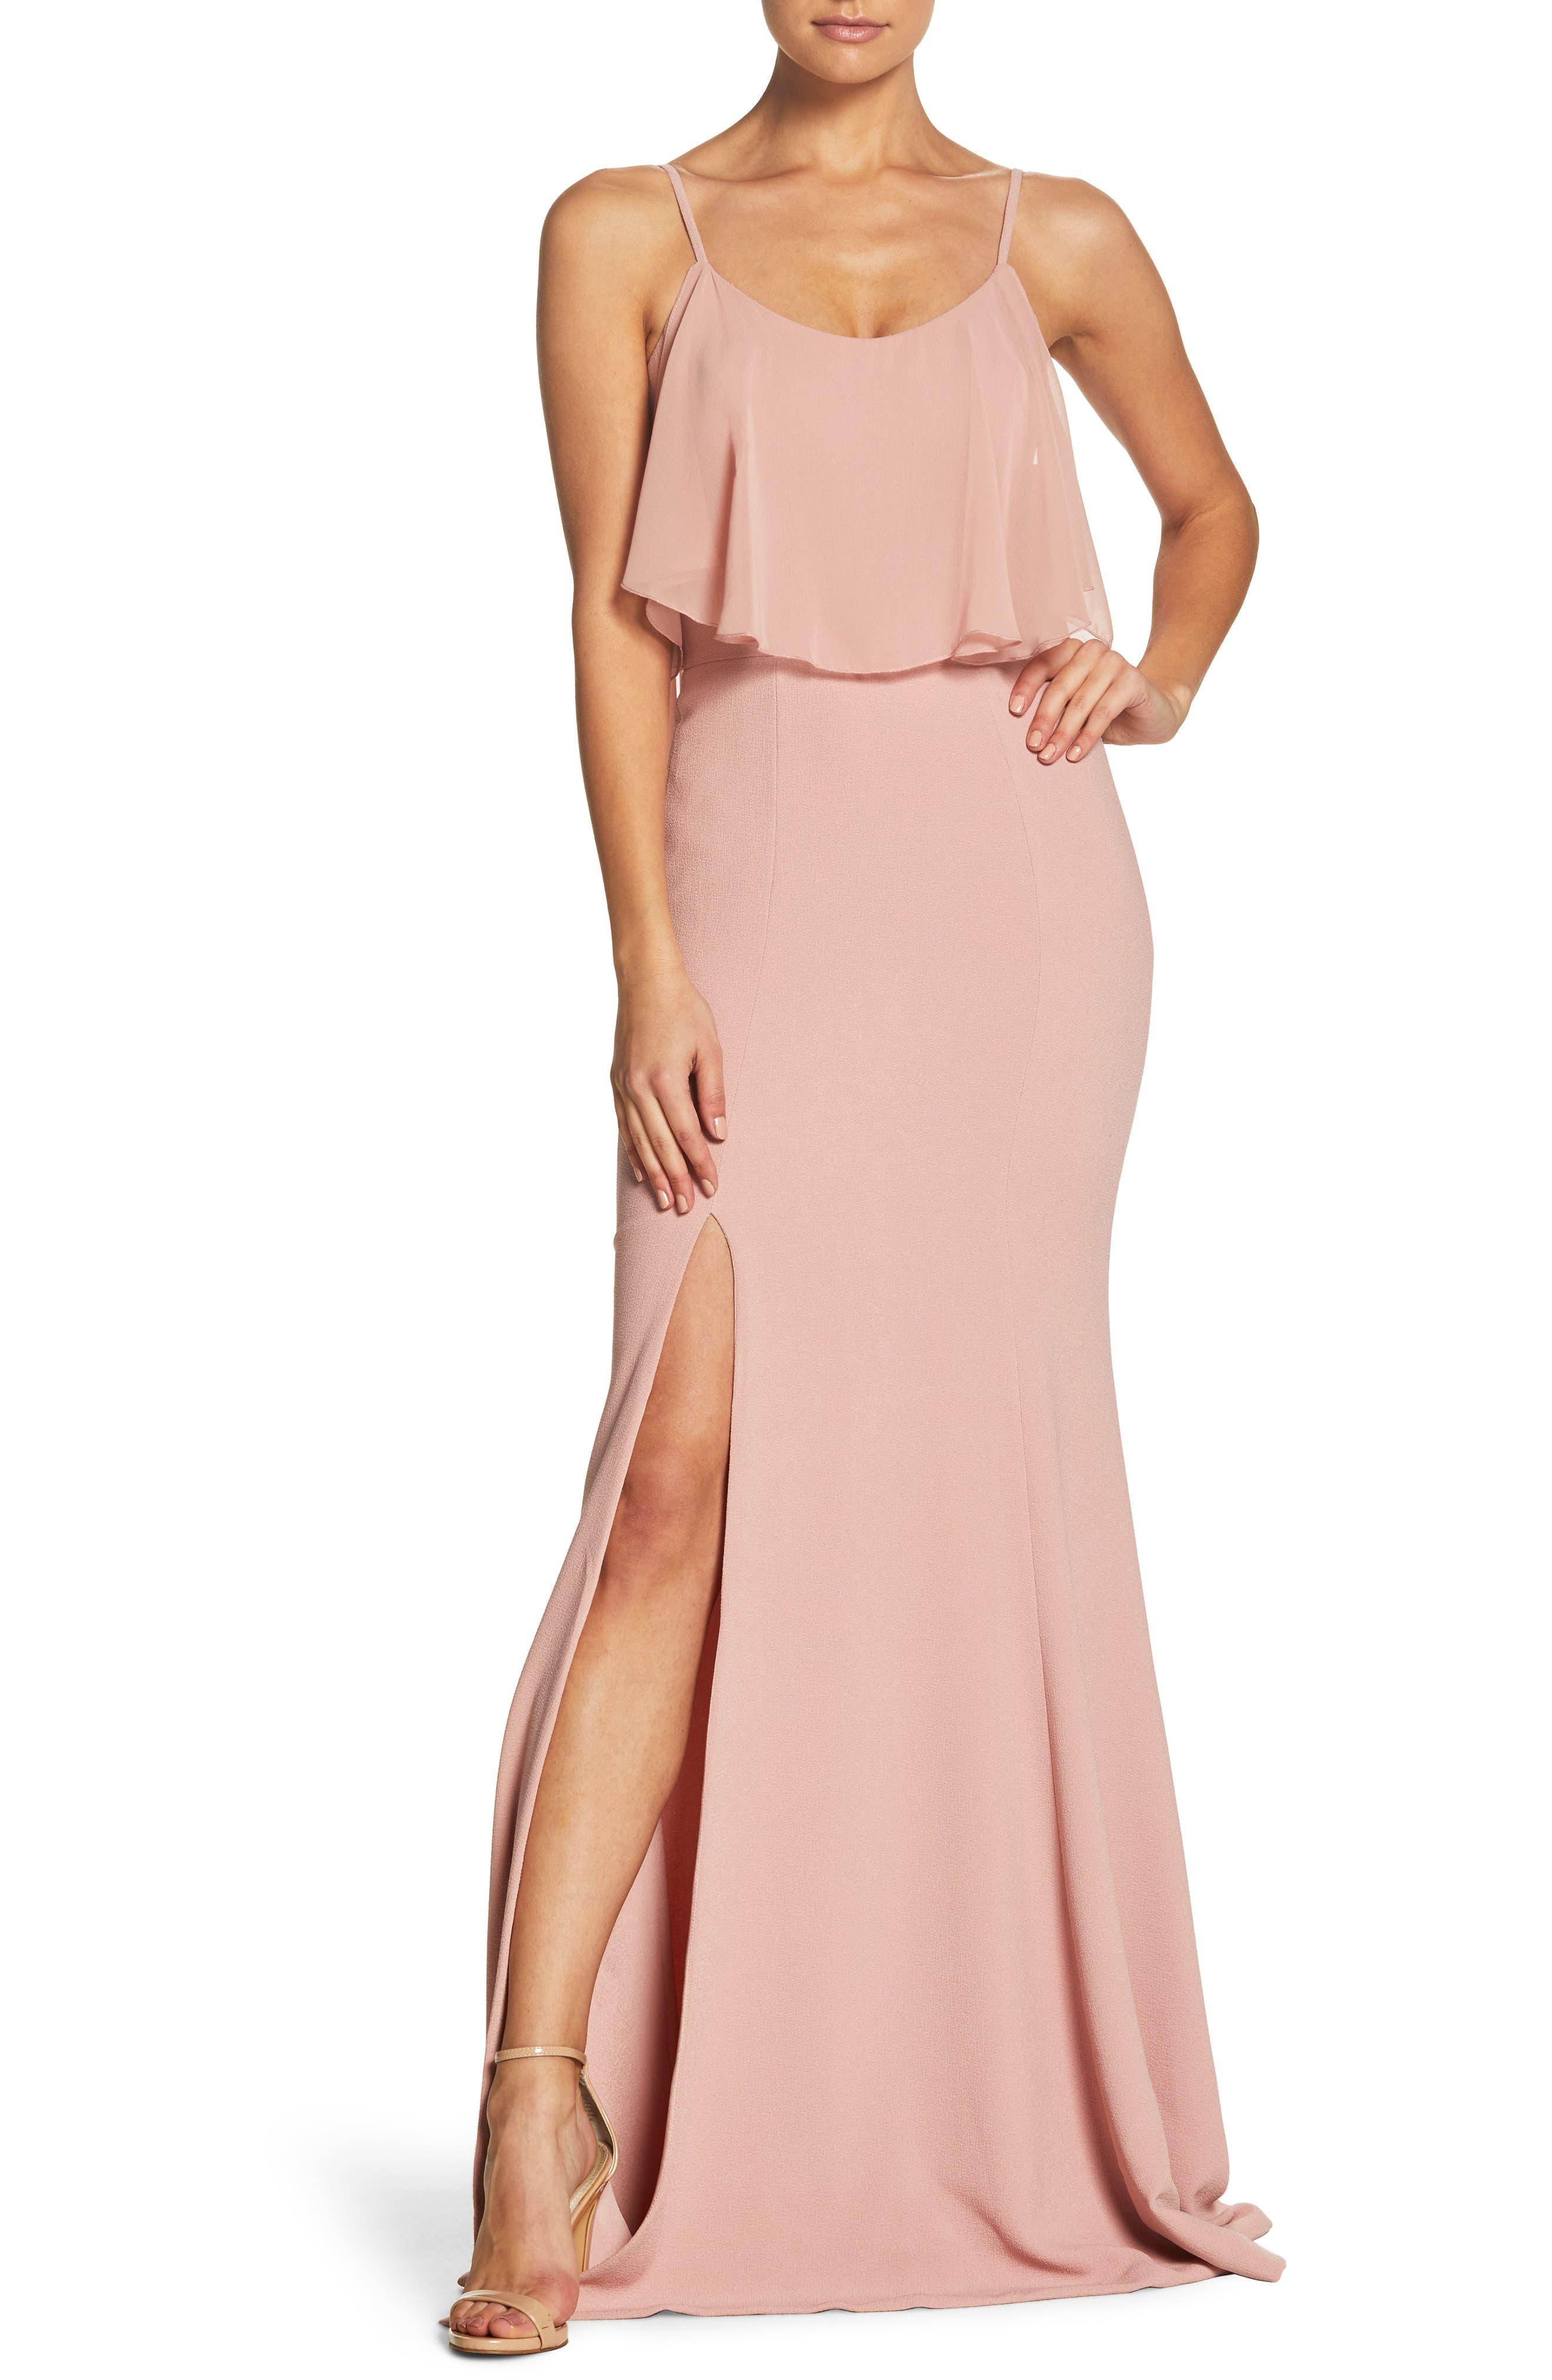 Diana Cold Shoulder Side Slit Gown,                             Main thumbnail 1, color,                             Blush